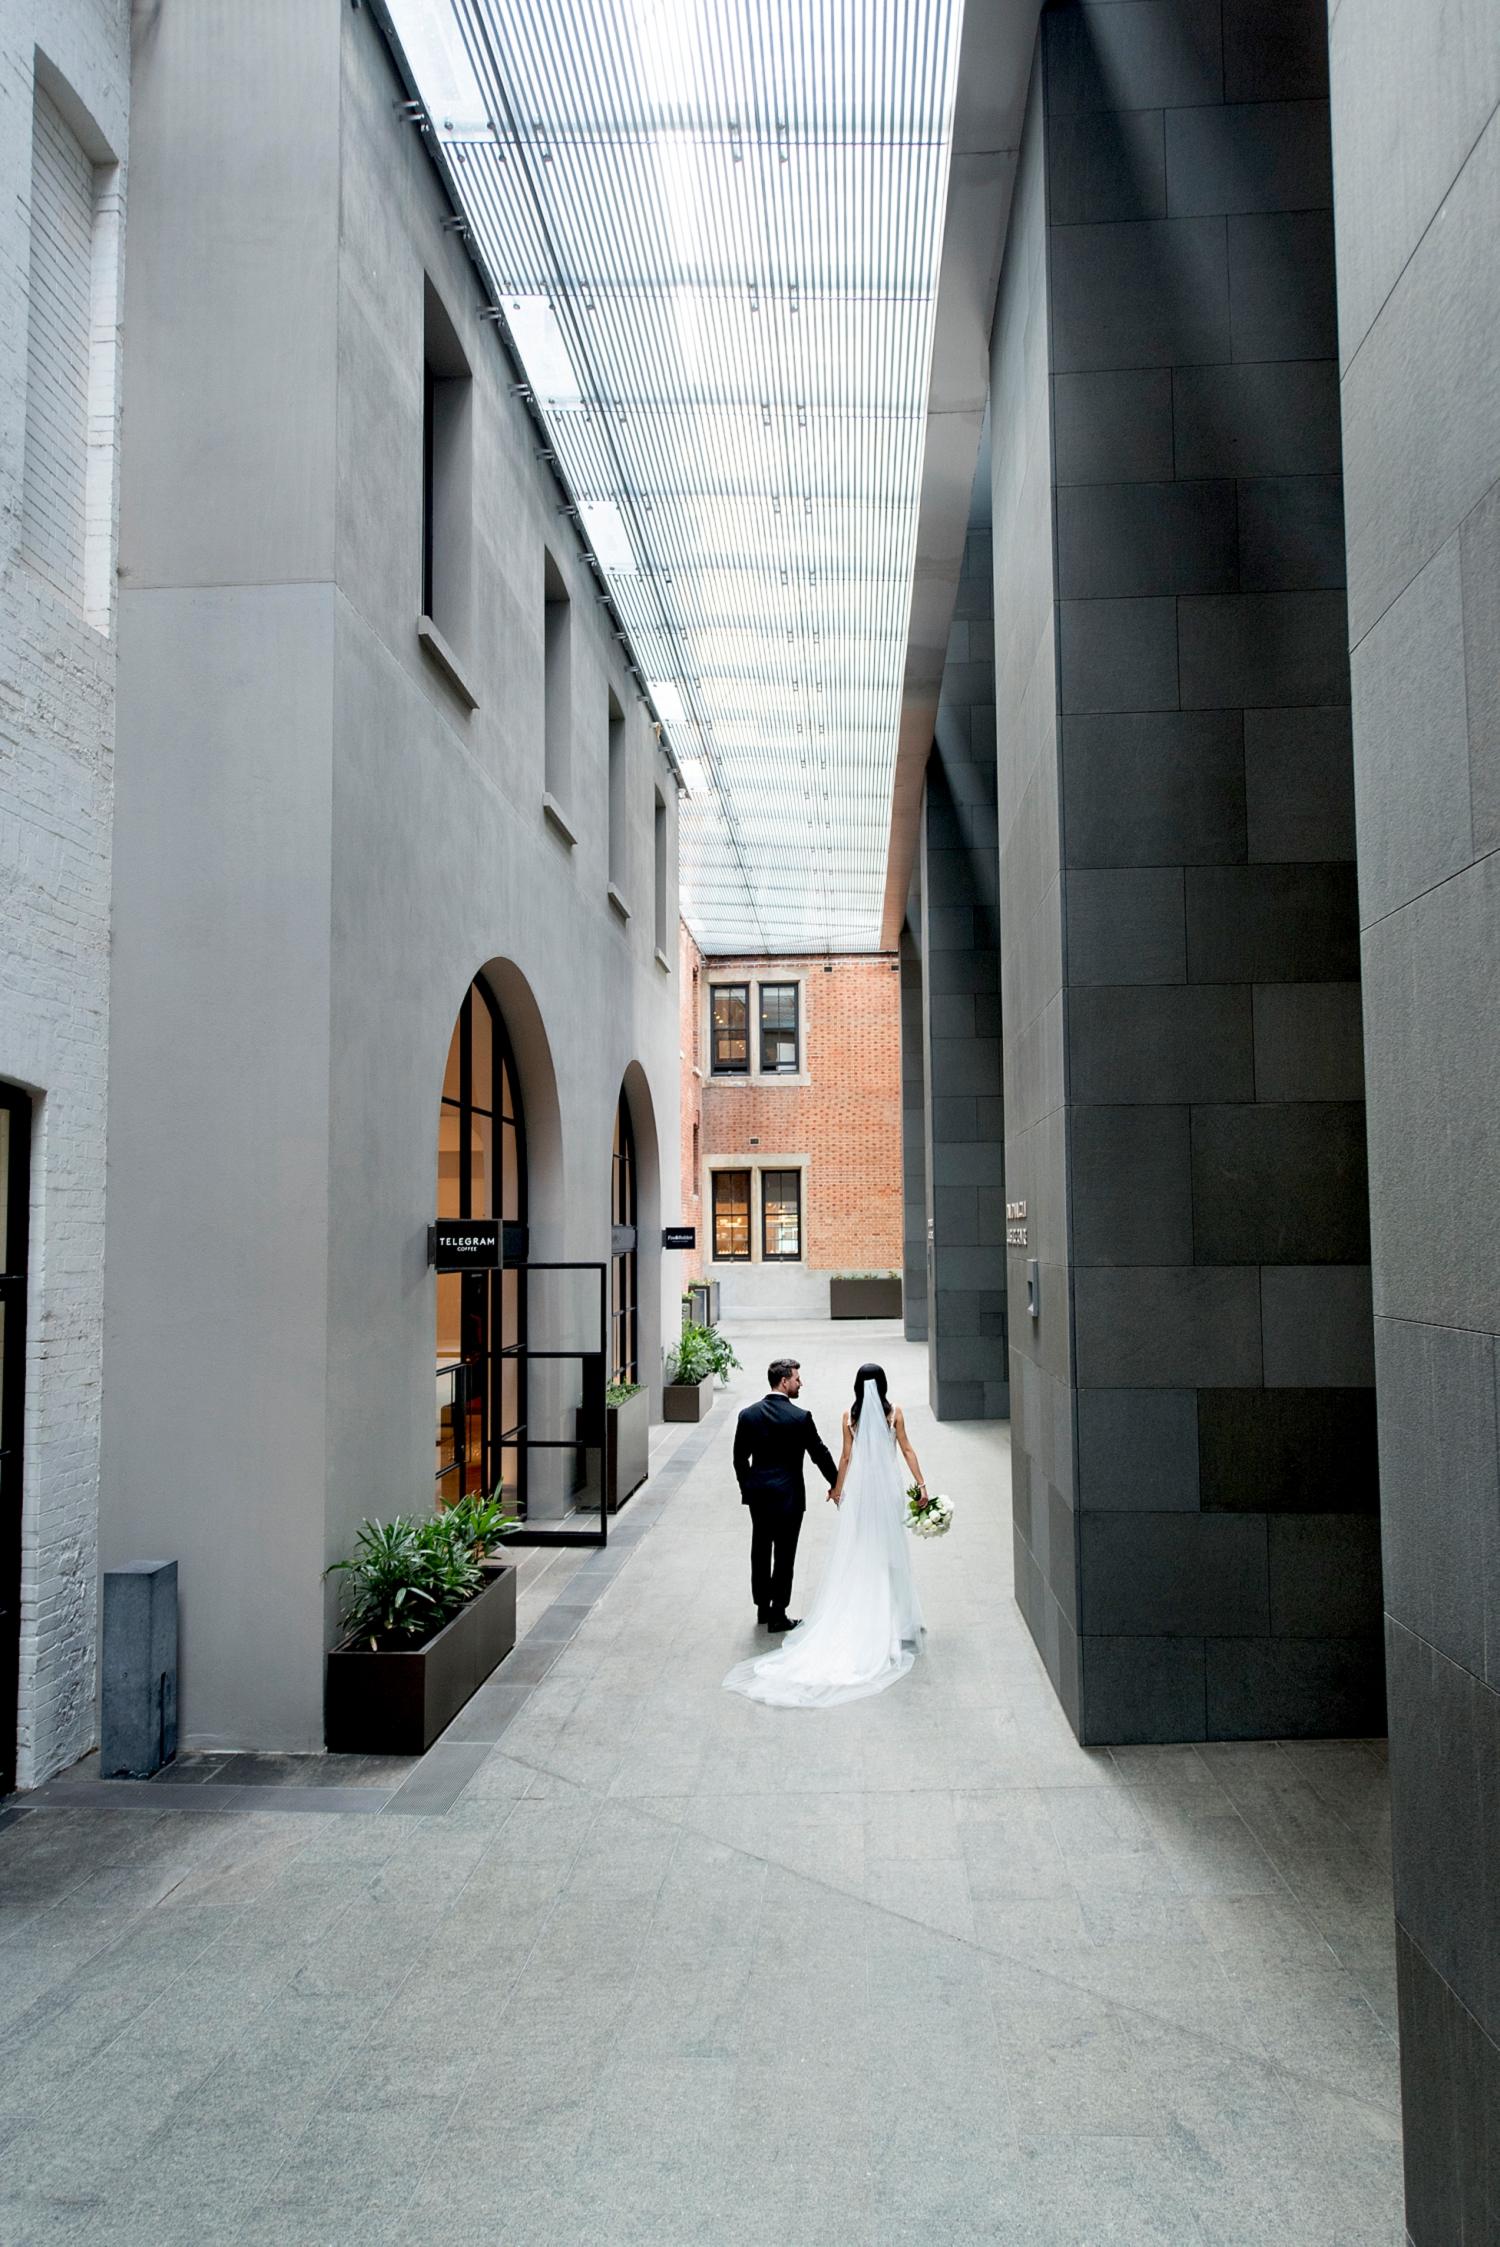 57_treasury buildings wedding perth.jpg